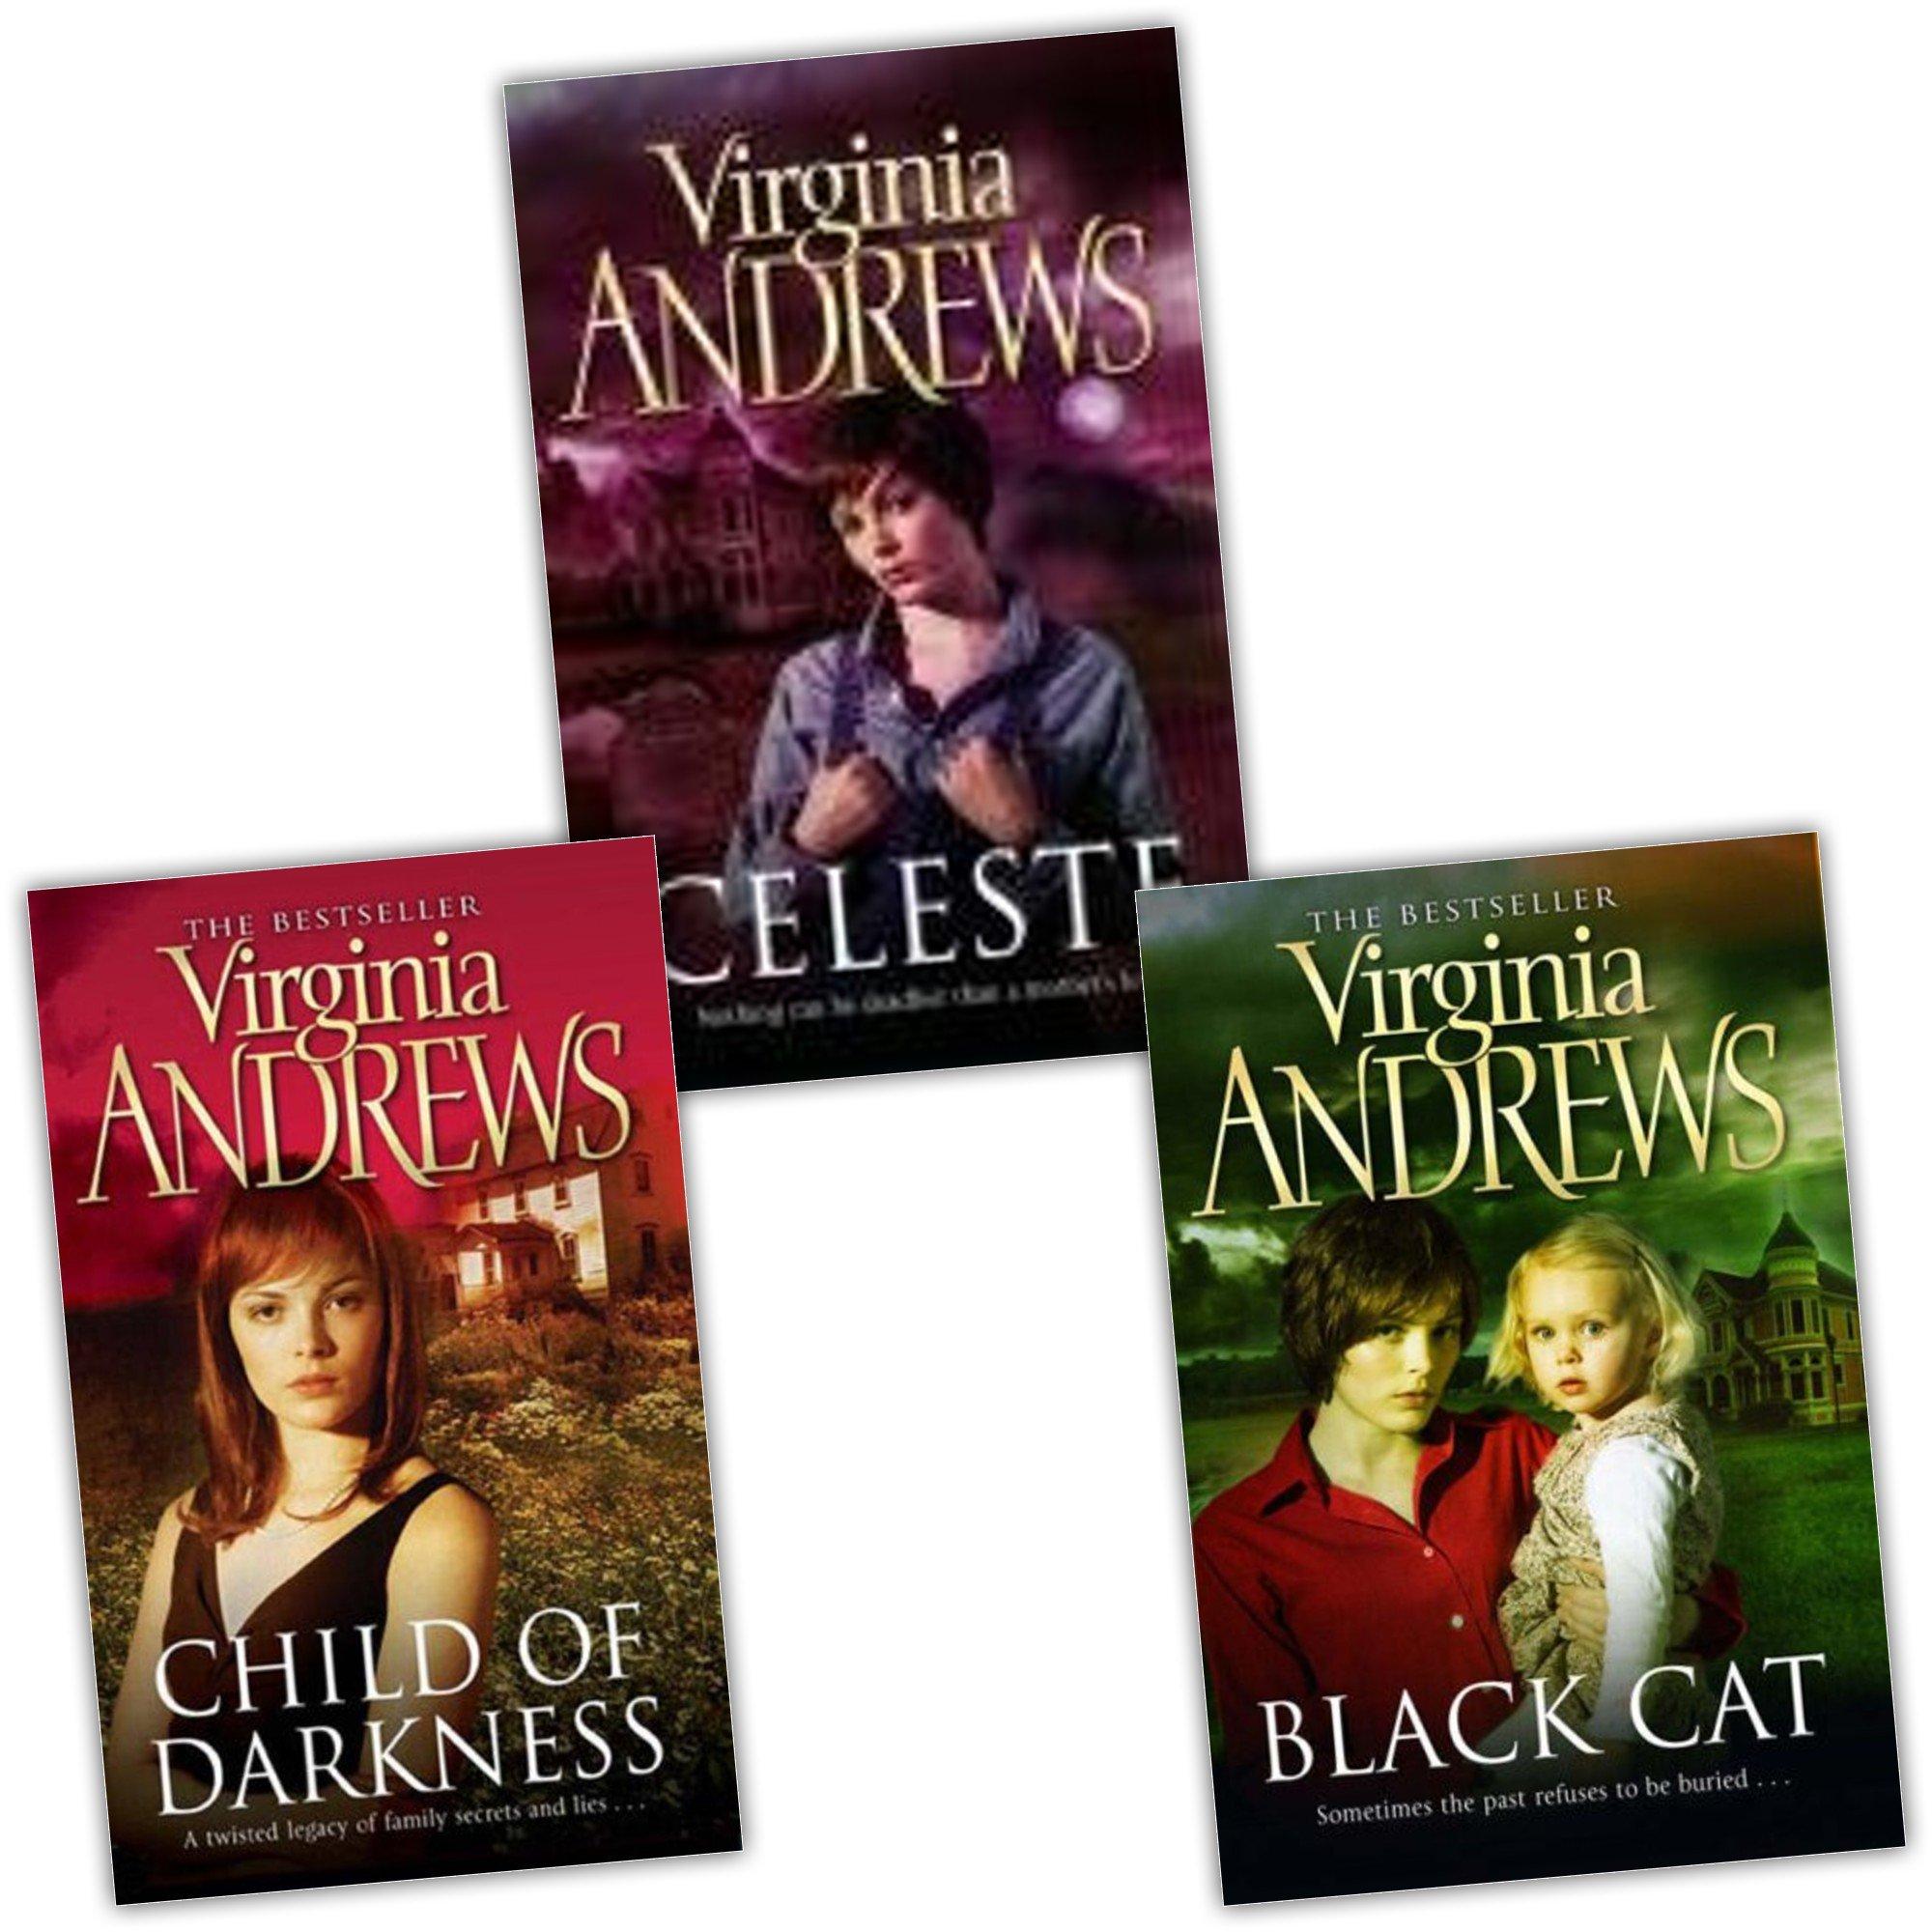 Download Virginia Andrews Gemini Series 3 Books Set Collection Pack (Celeste, Black Cat, Child of Darkness) (Gemini Series) pdf